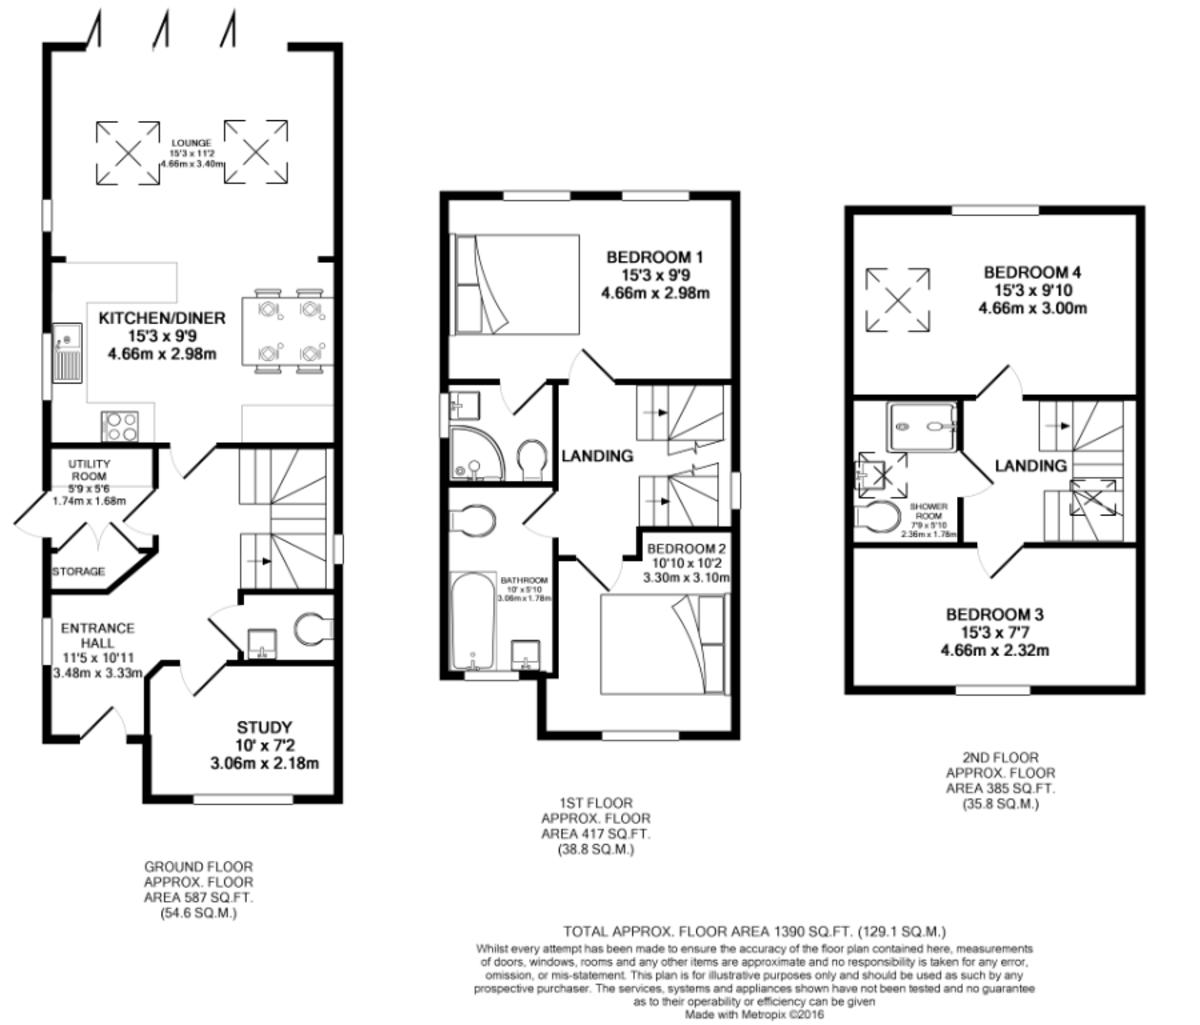 Dale Road, Keyworth, NG12 5HS Floorplan